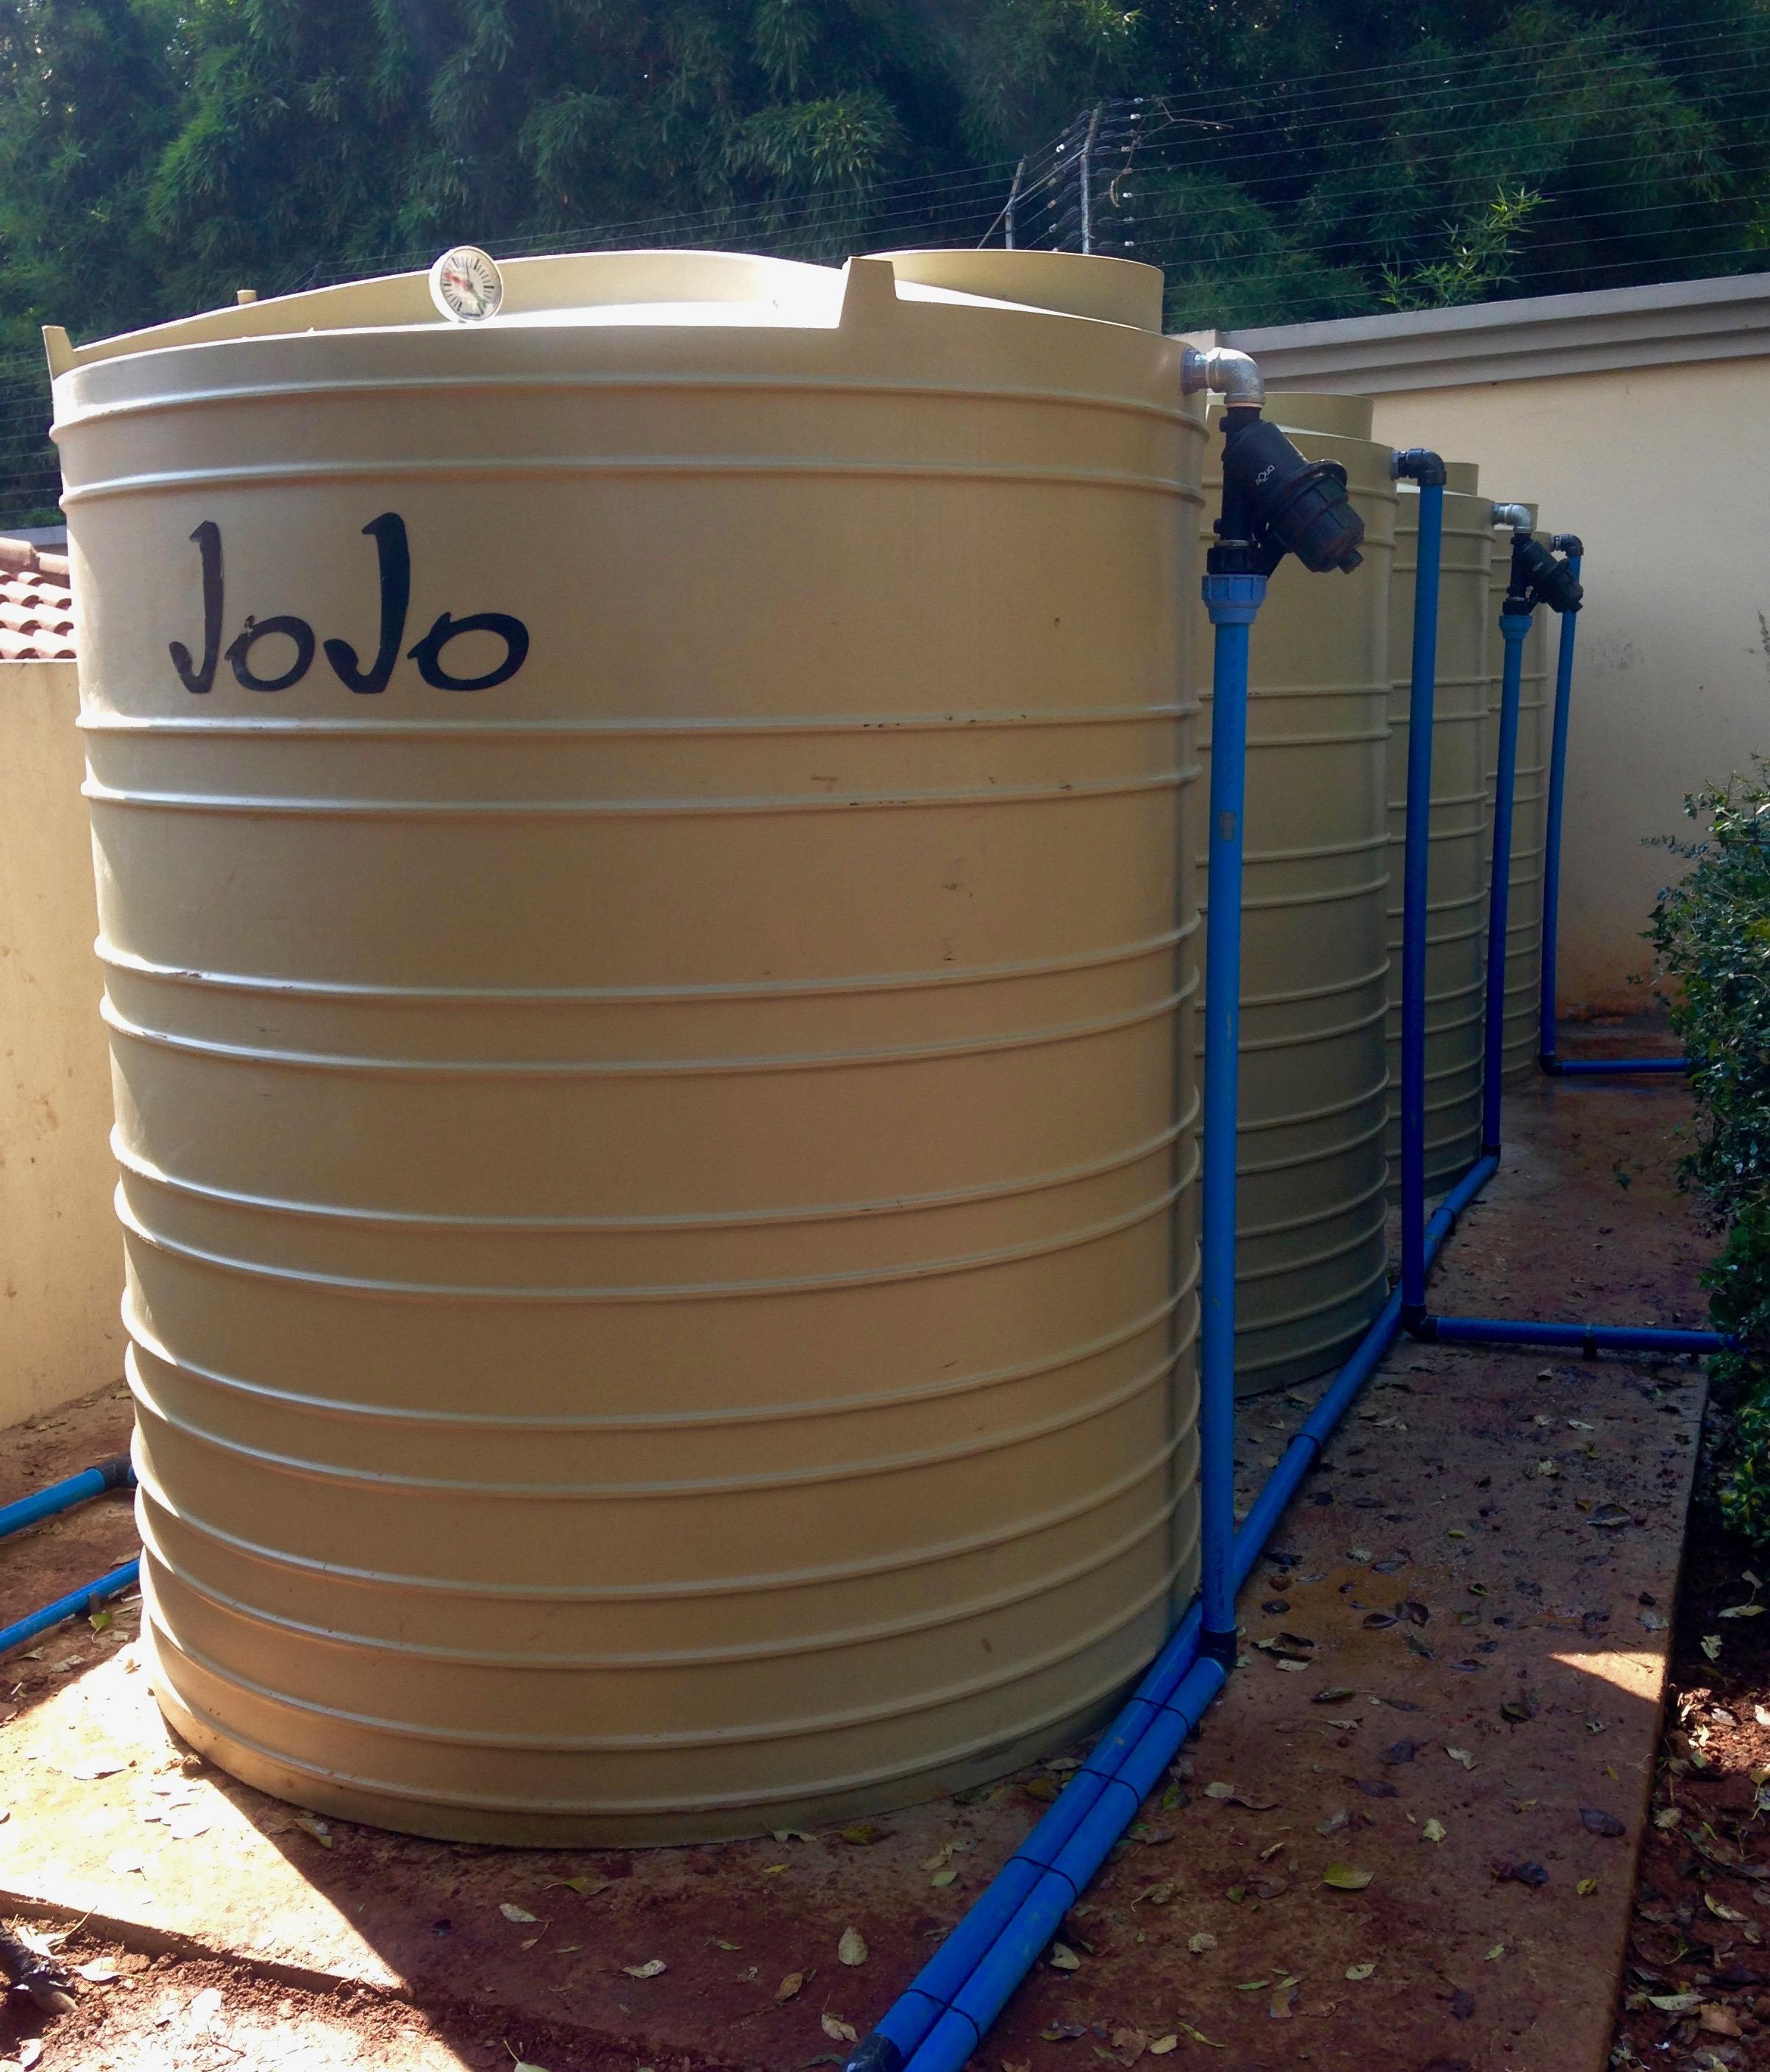 20 000L Jojo Storage tank system. Rainwater Harvesting System